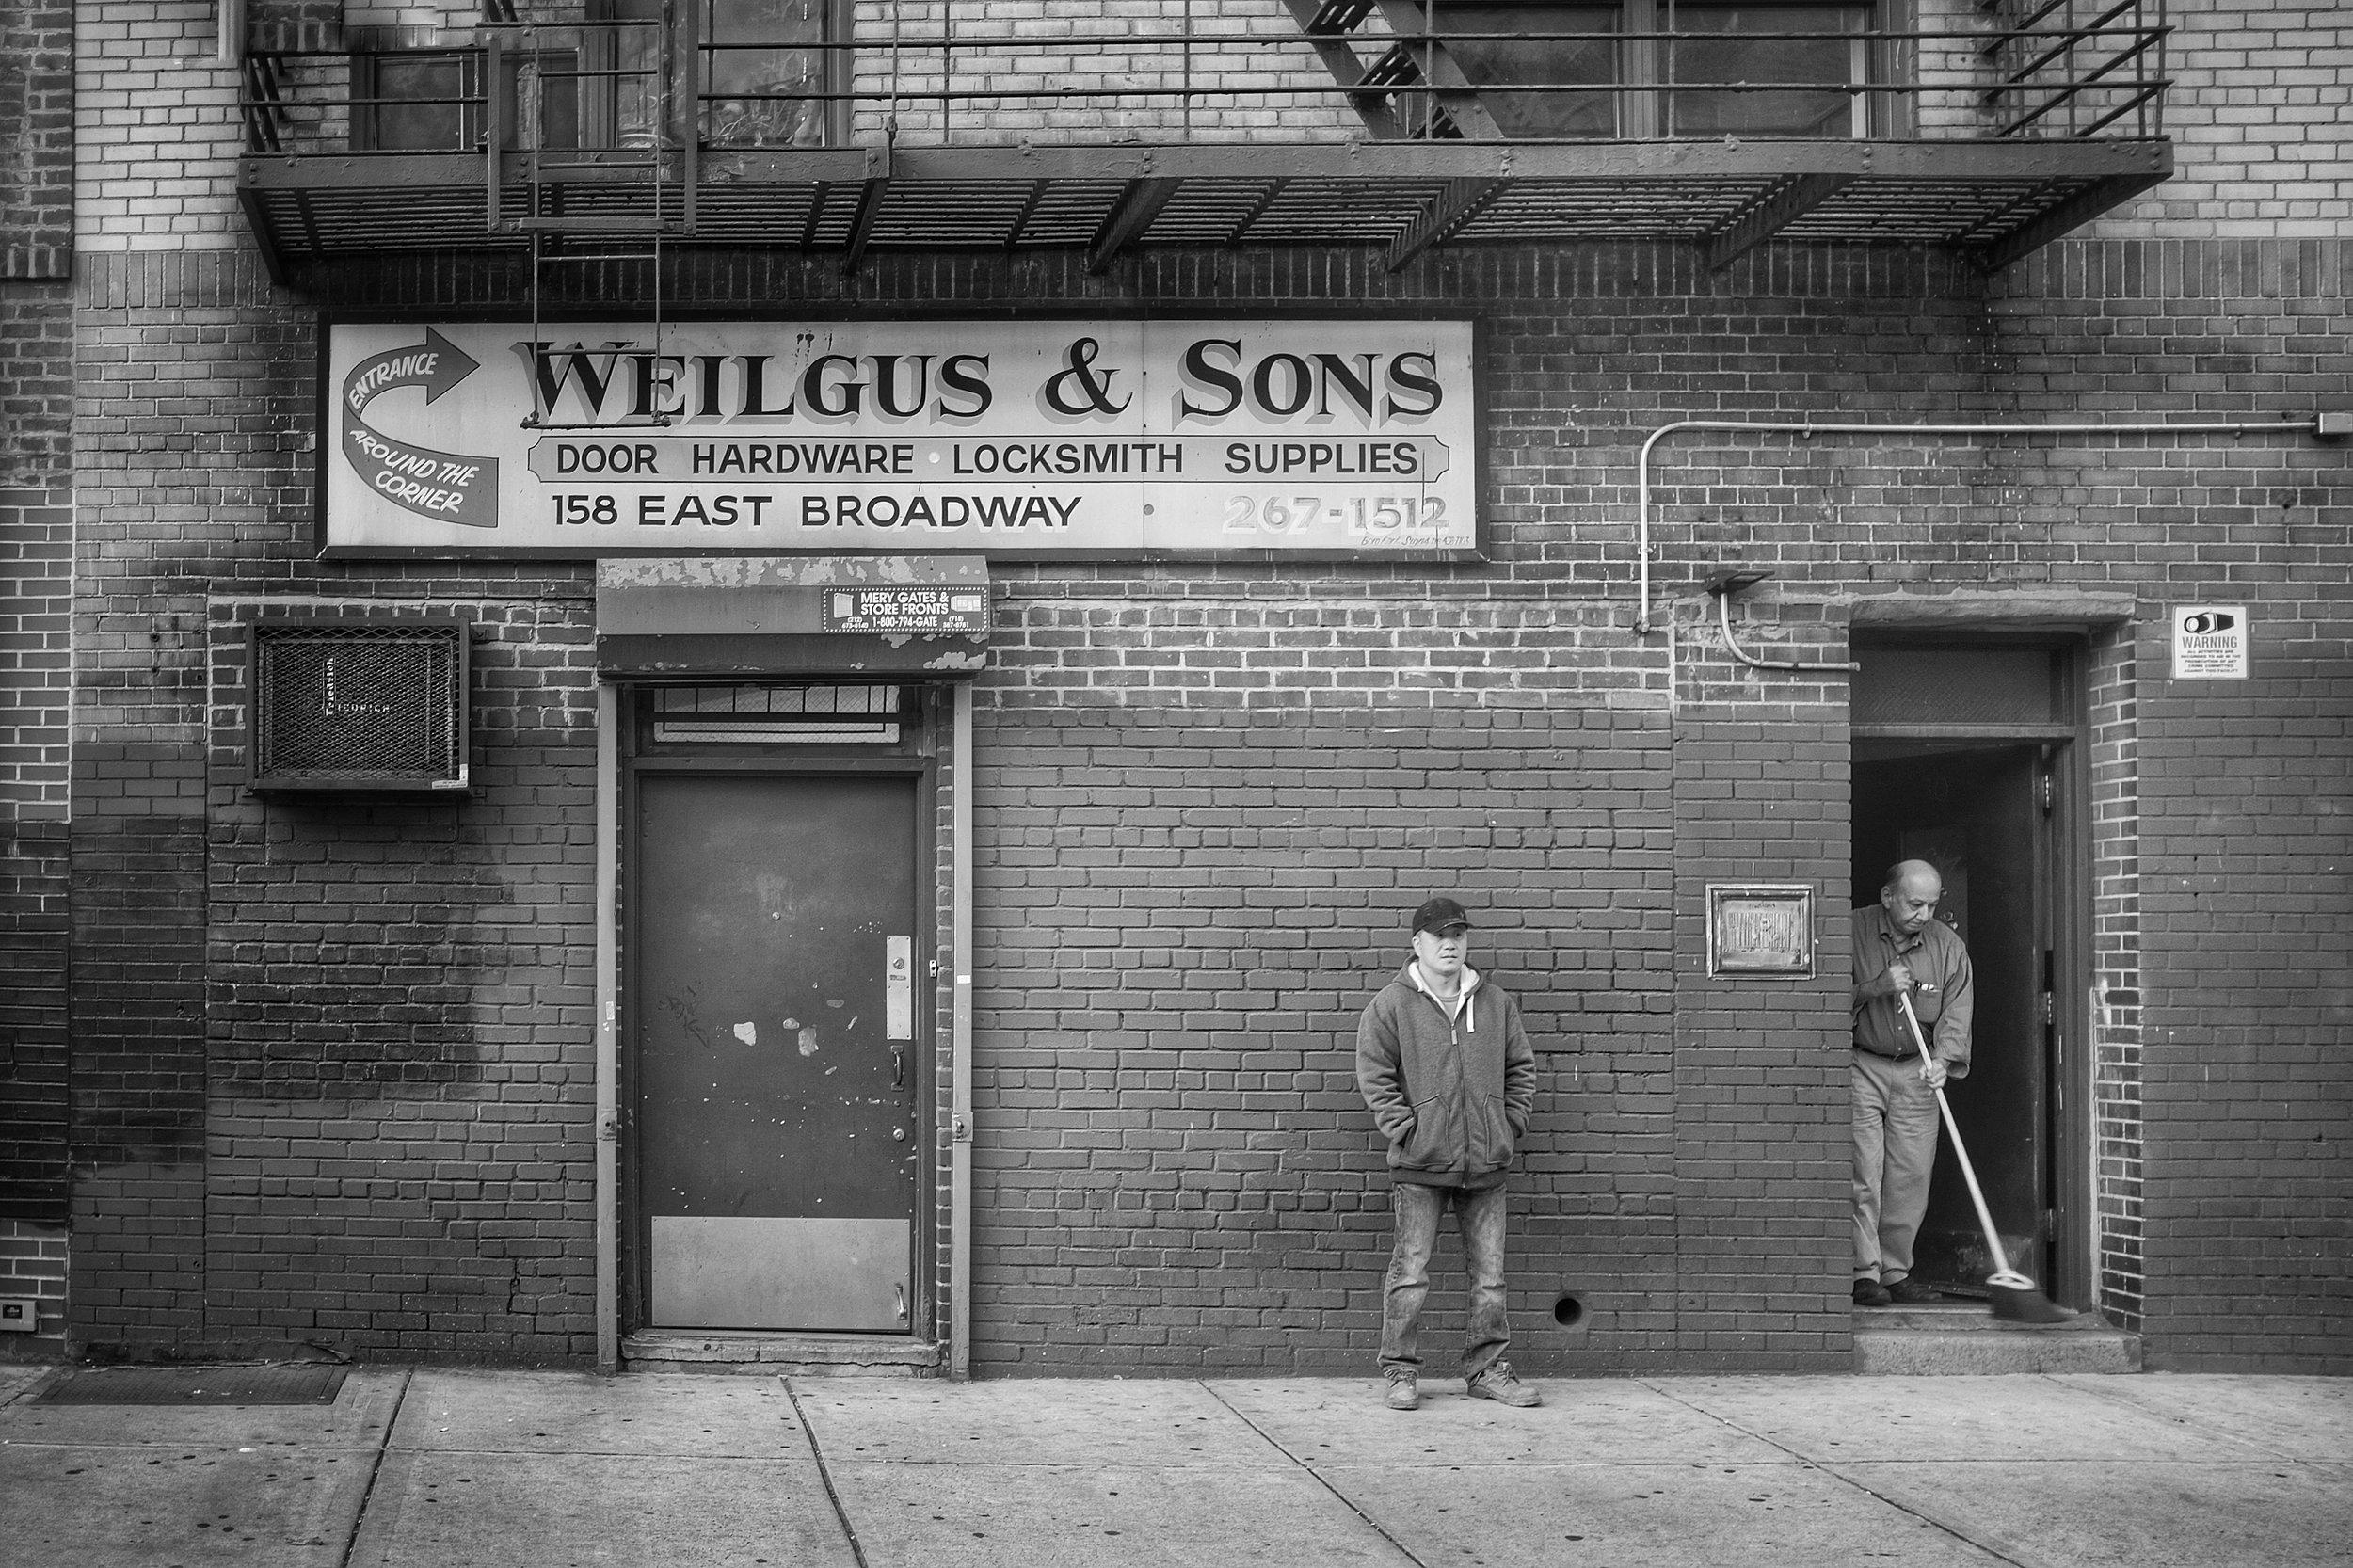 Weilgus & Sons. Canal Street. Lower East Side. New York City. 2016. © Matthew Kraus.